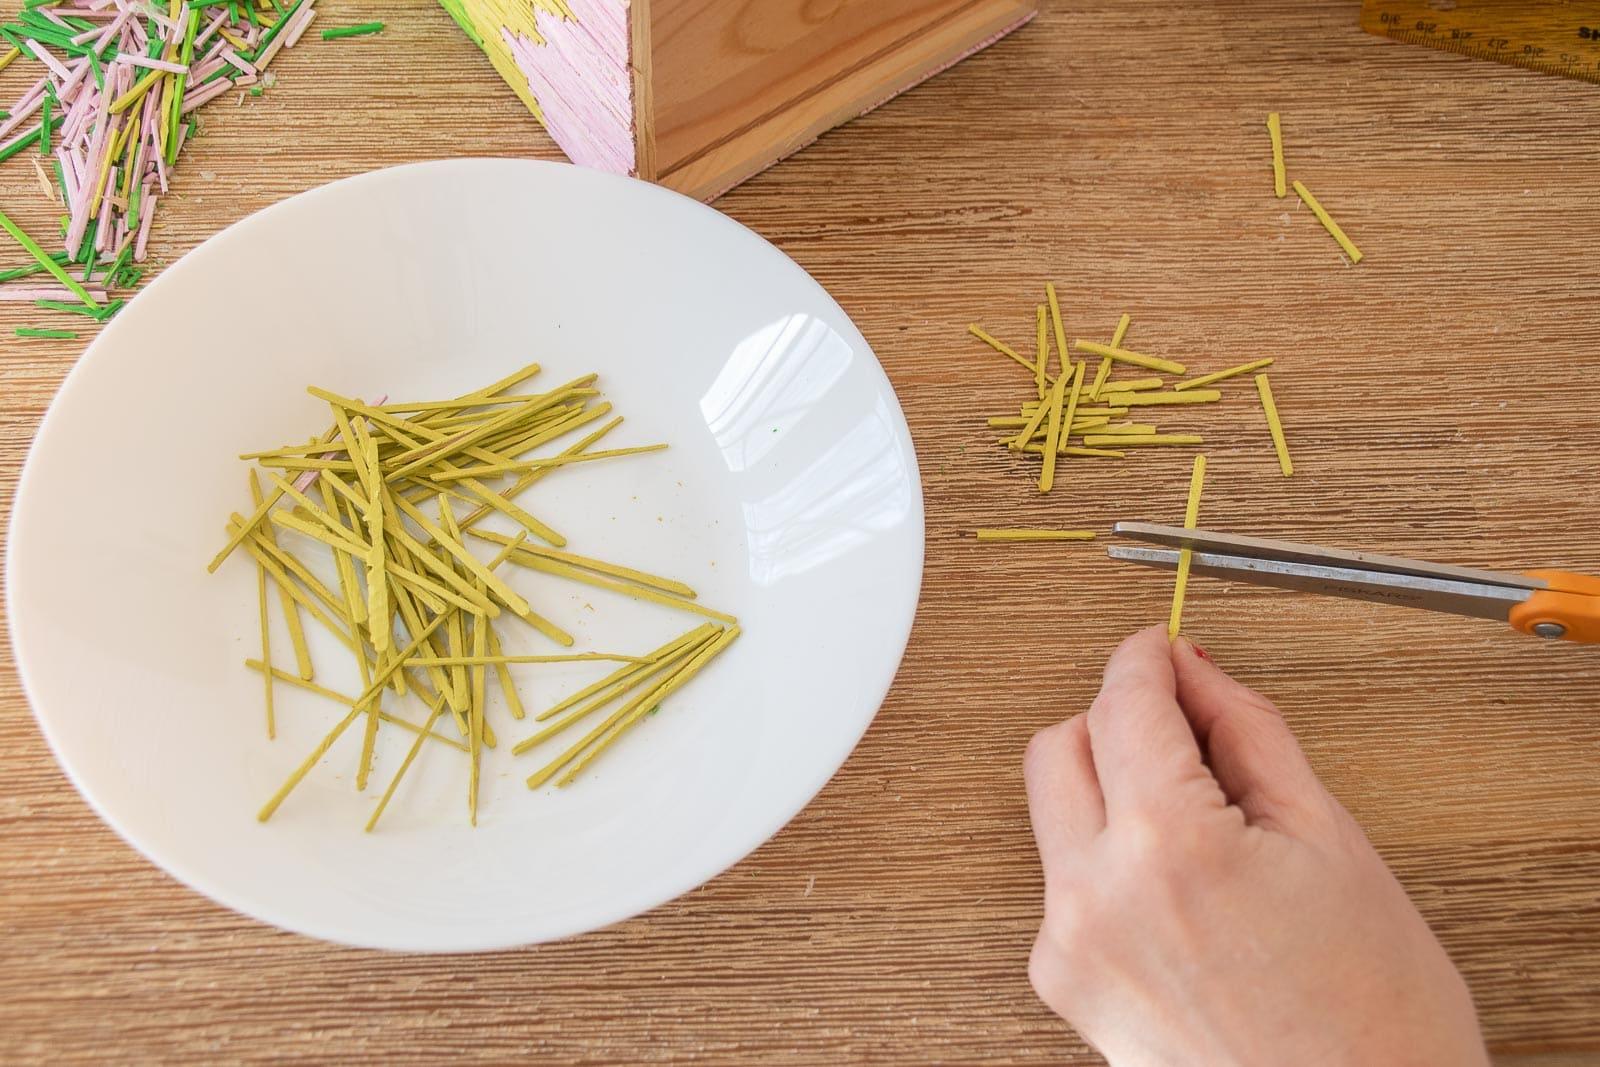 cut the toothpicks